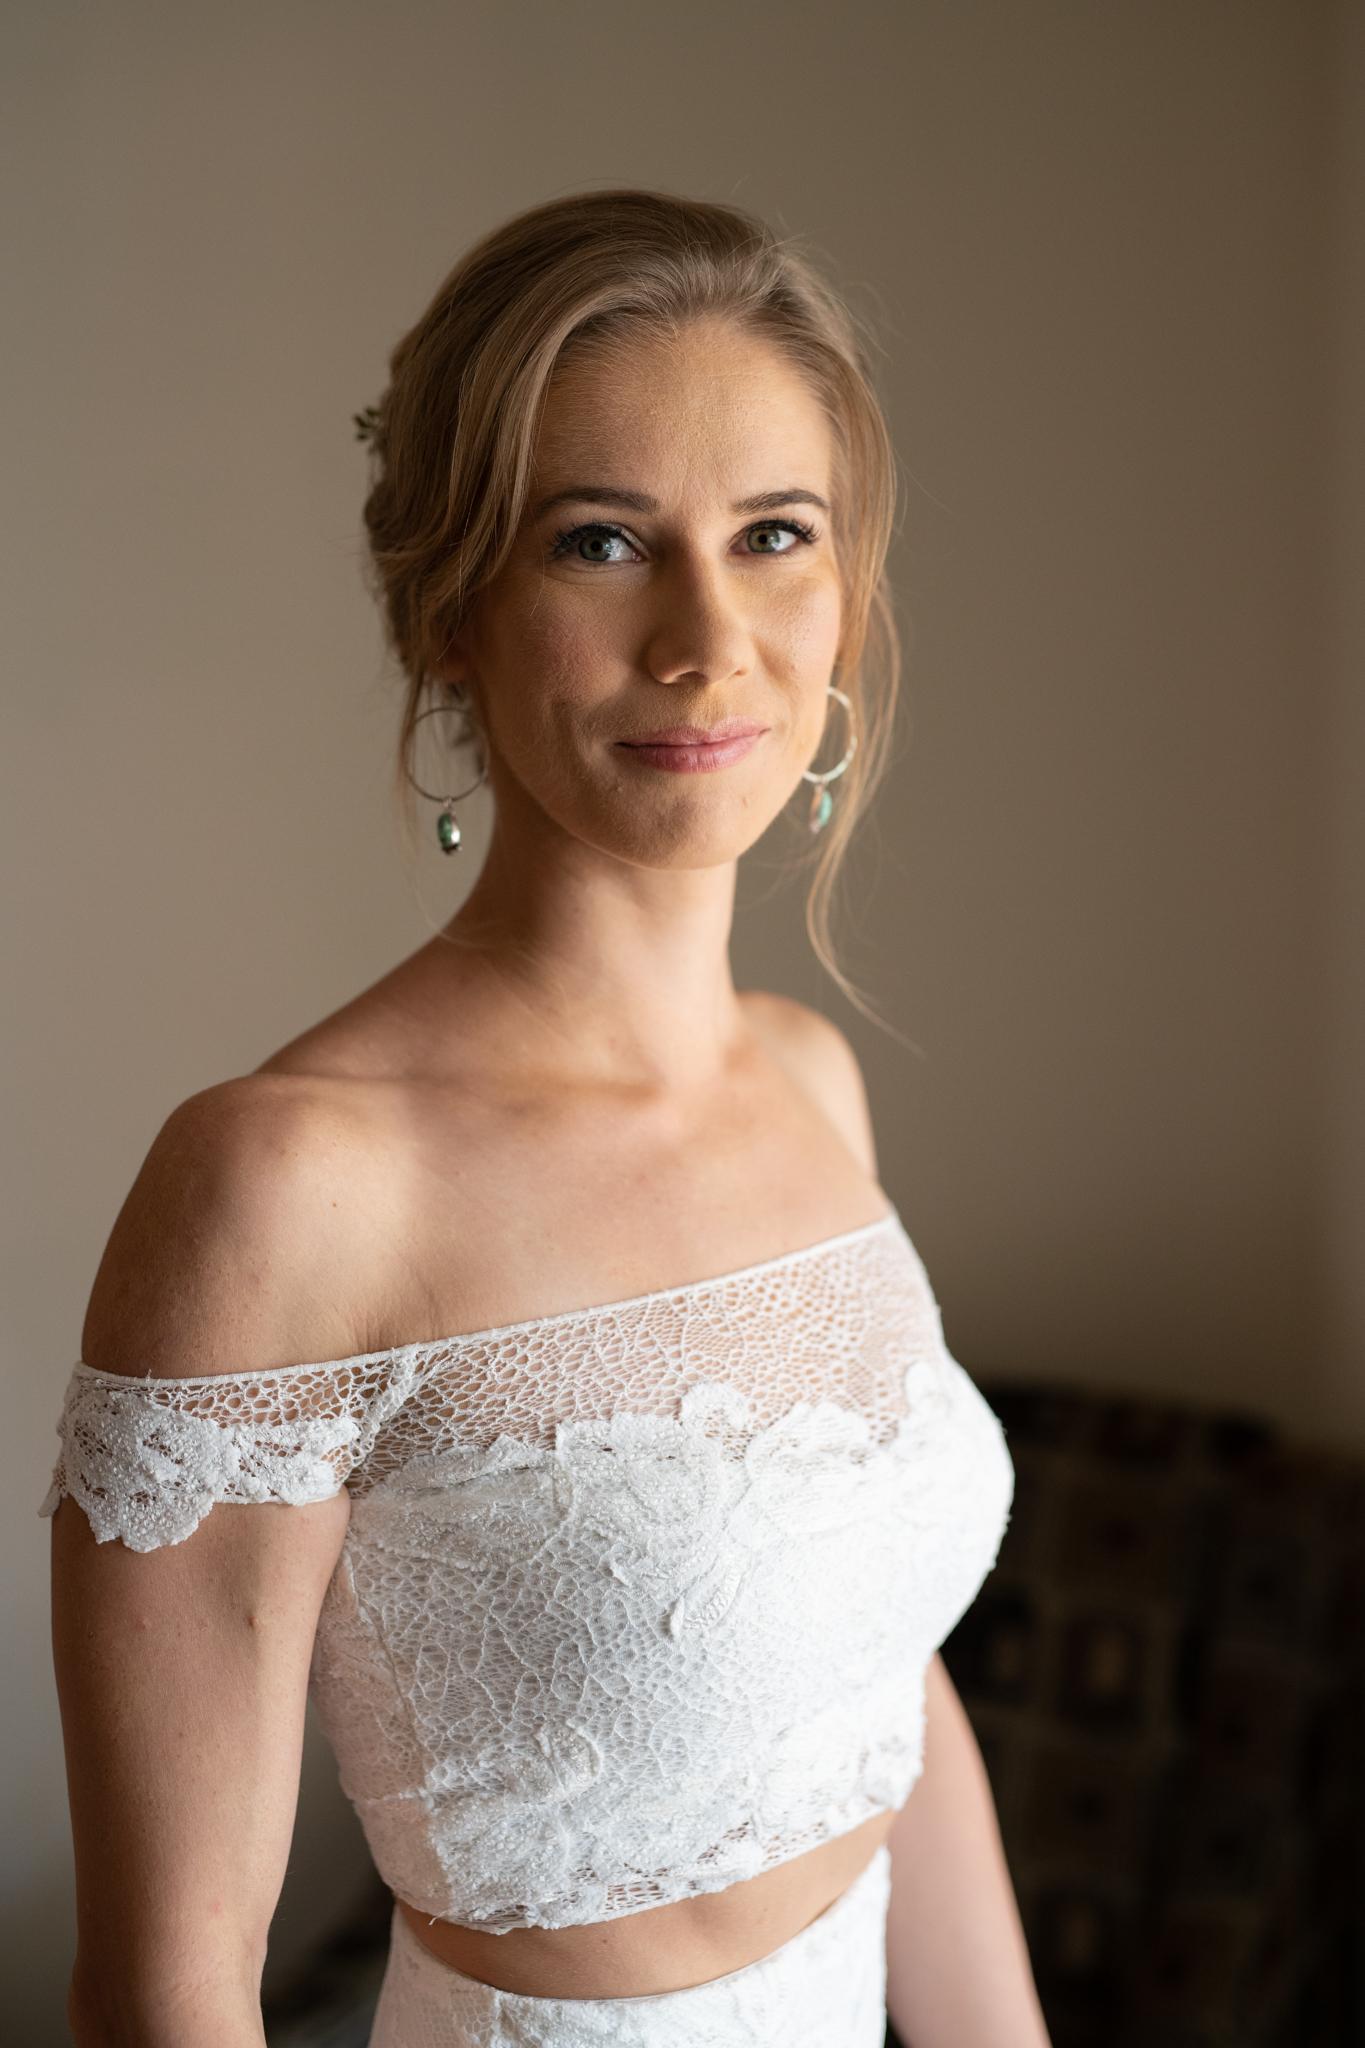 03_PRVW_Jenny_Ken_Wedding_Trevor_Hooper_Photo.jpg